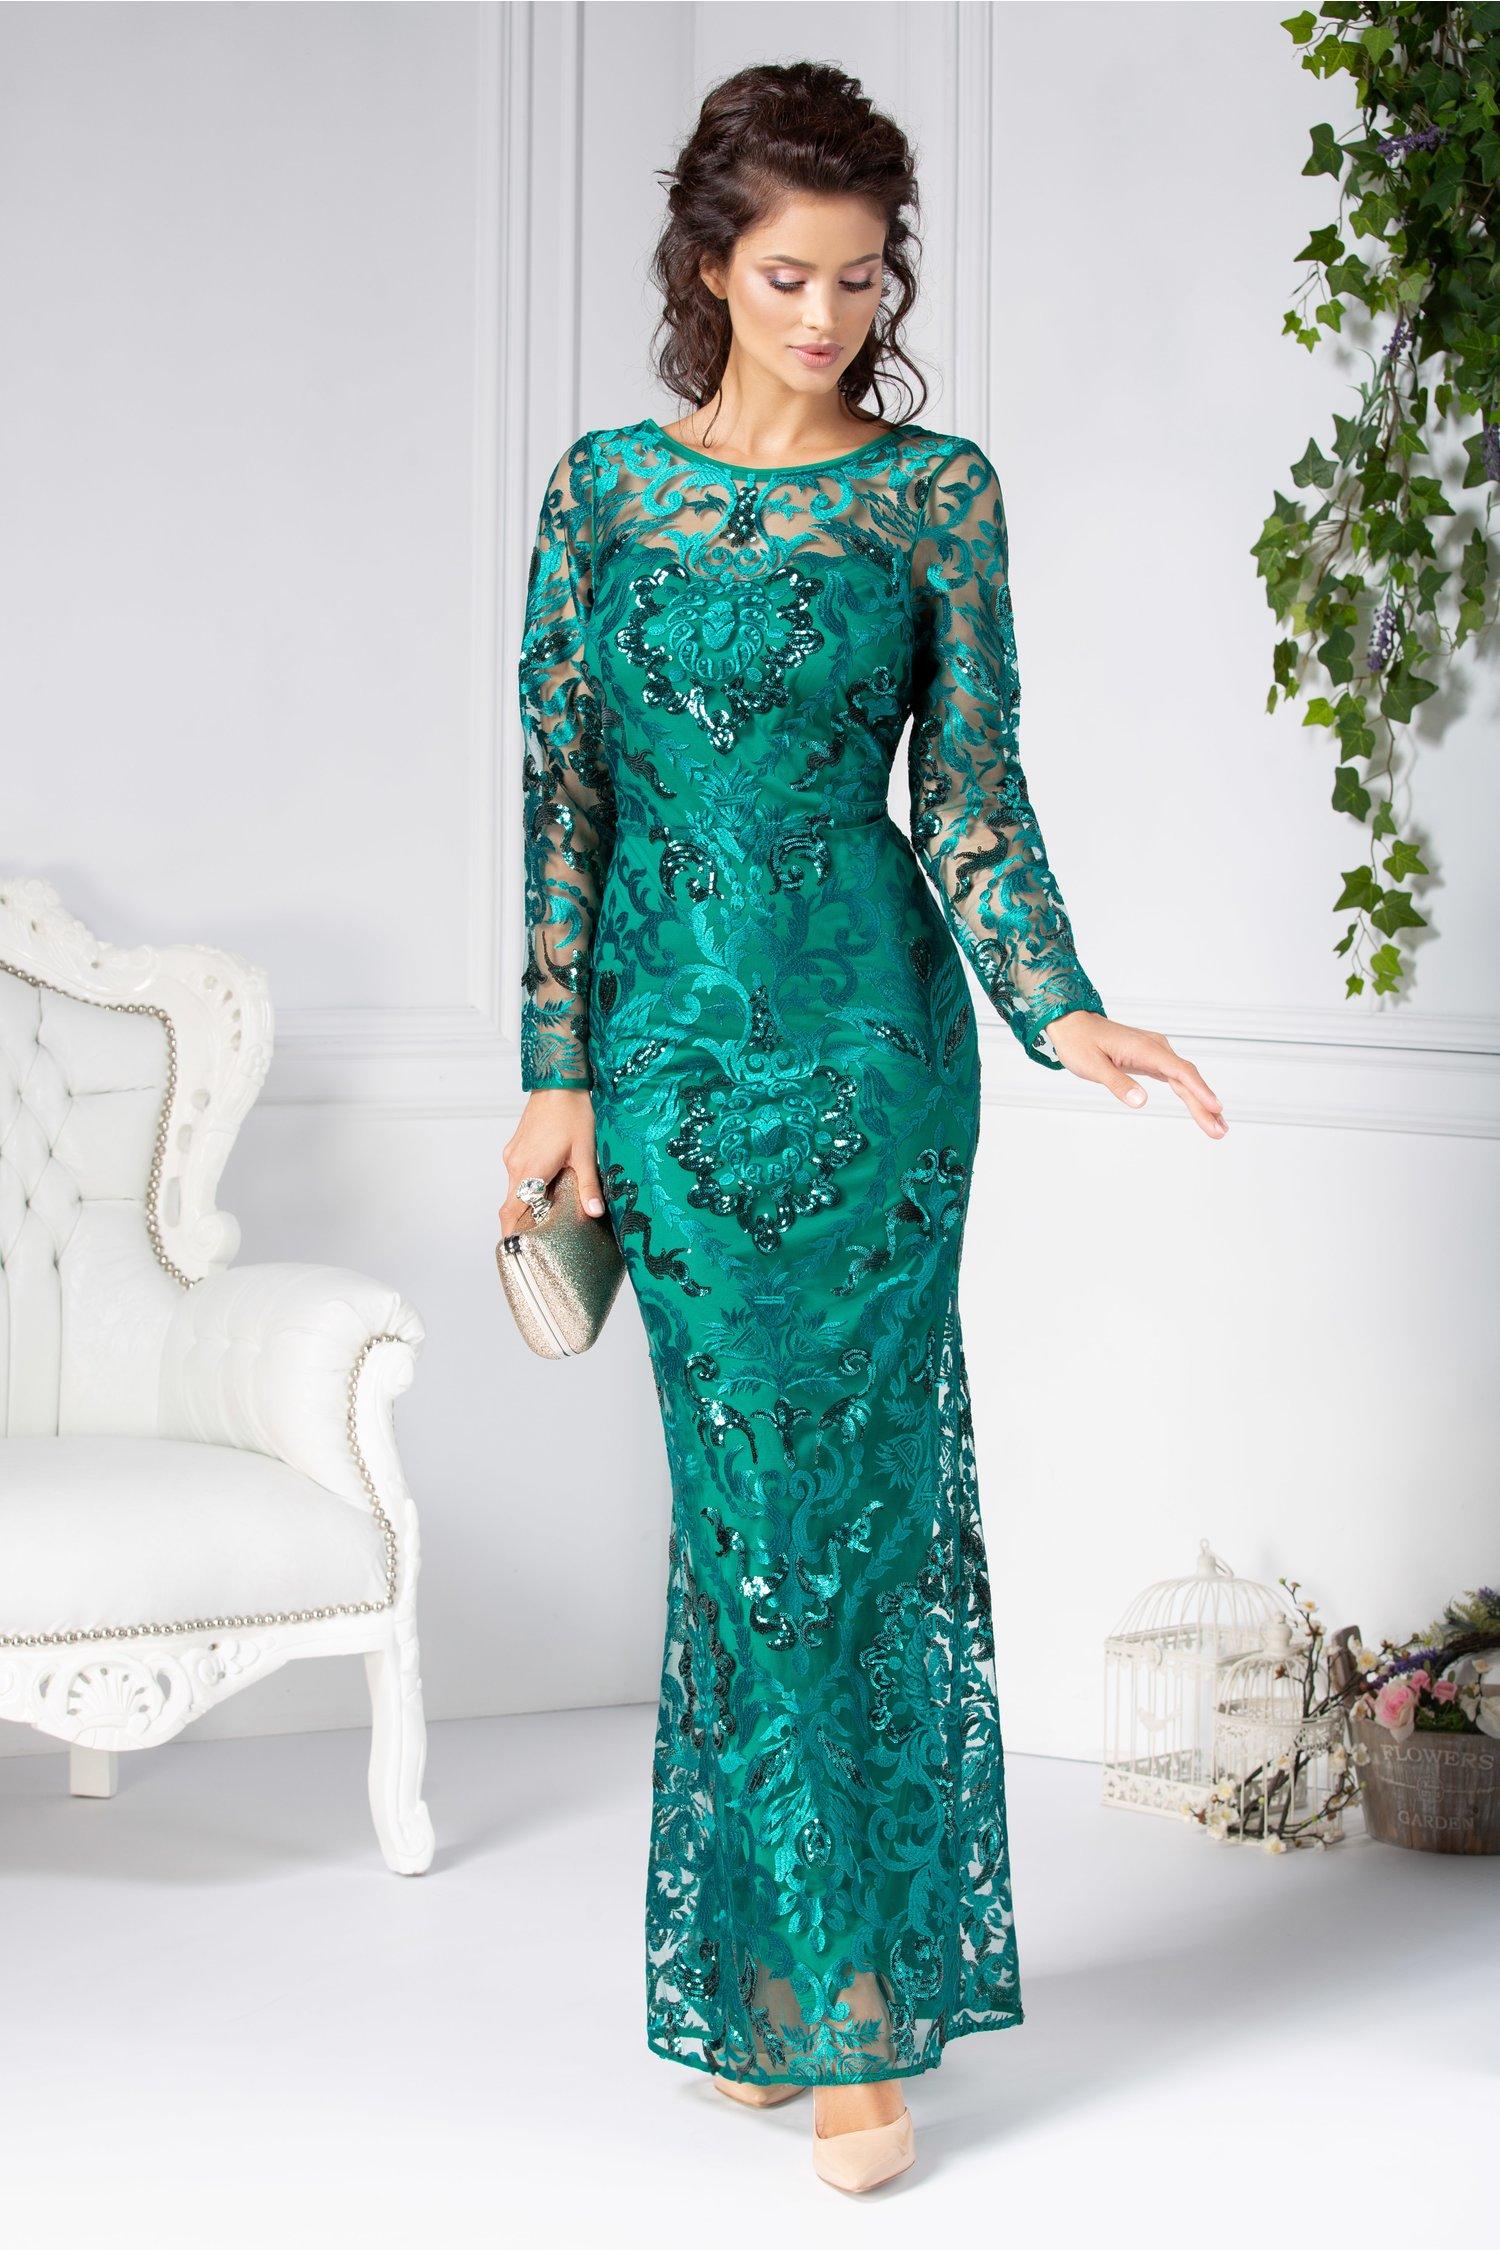 Rochie Catina verde lunga din dantela brodata